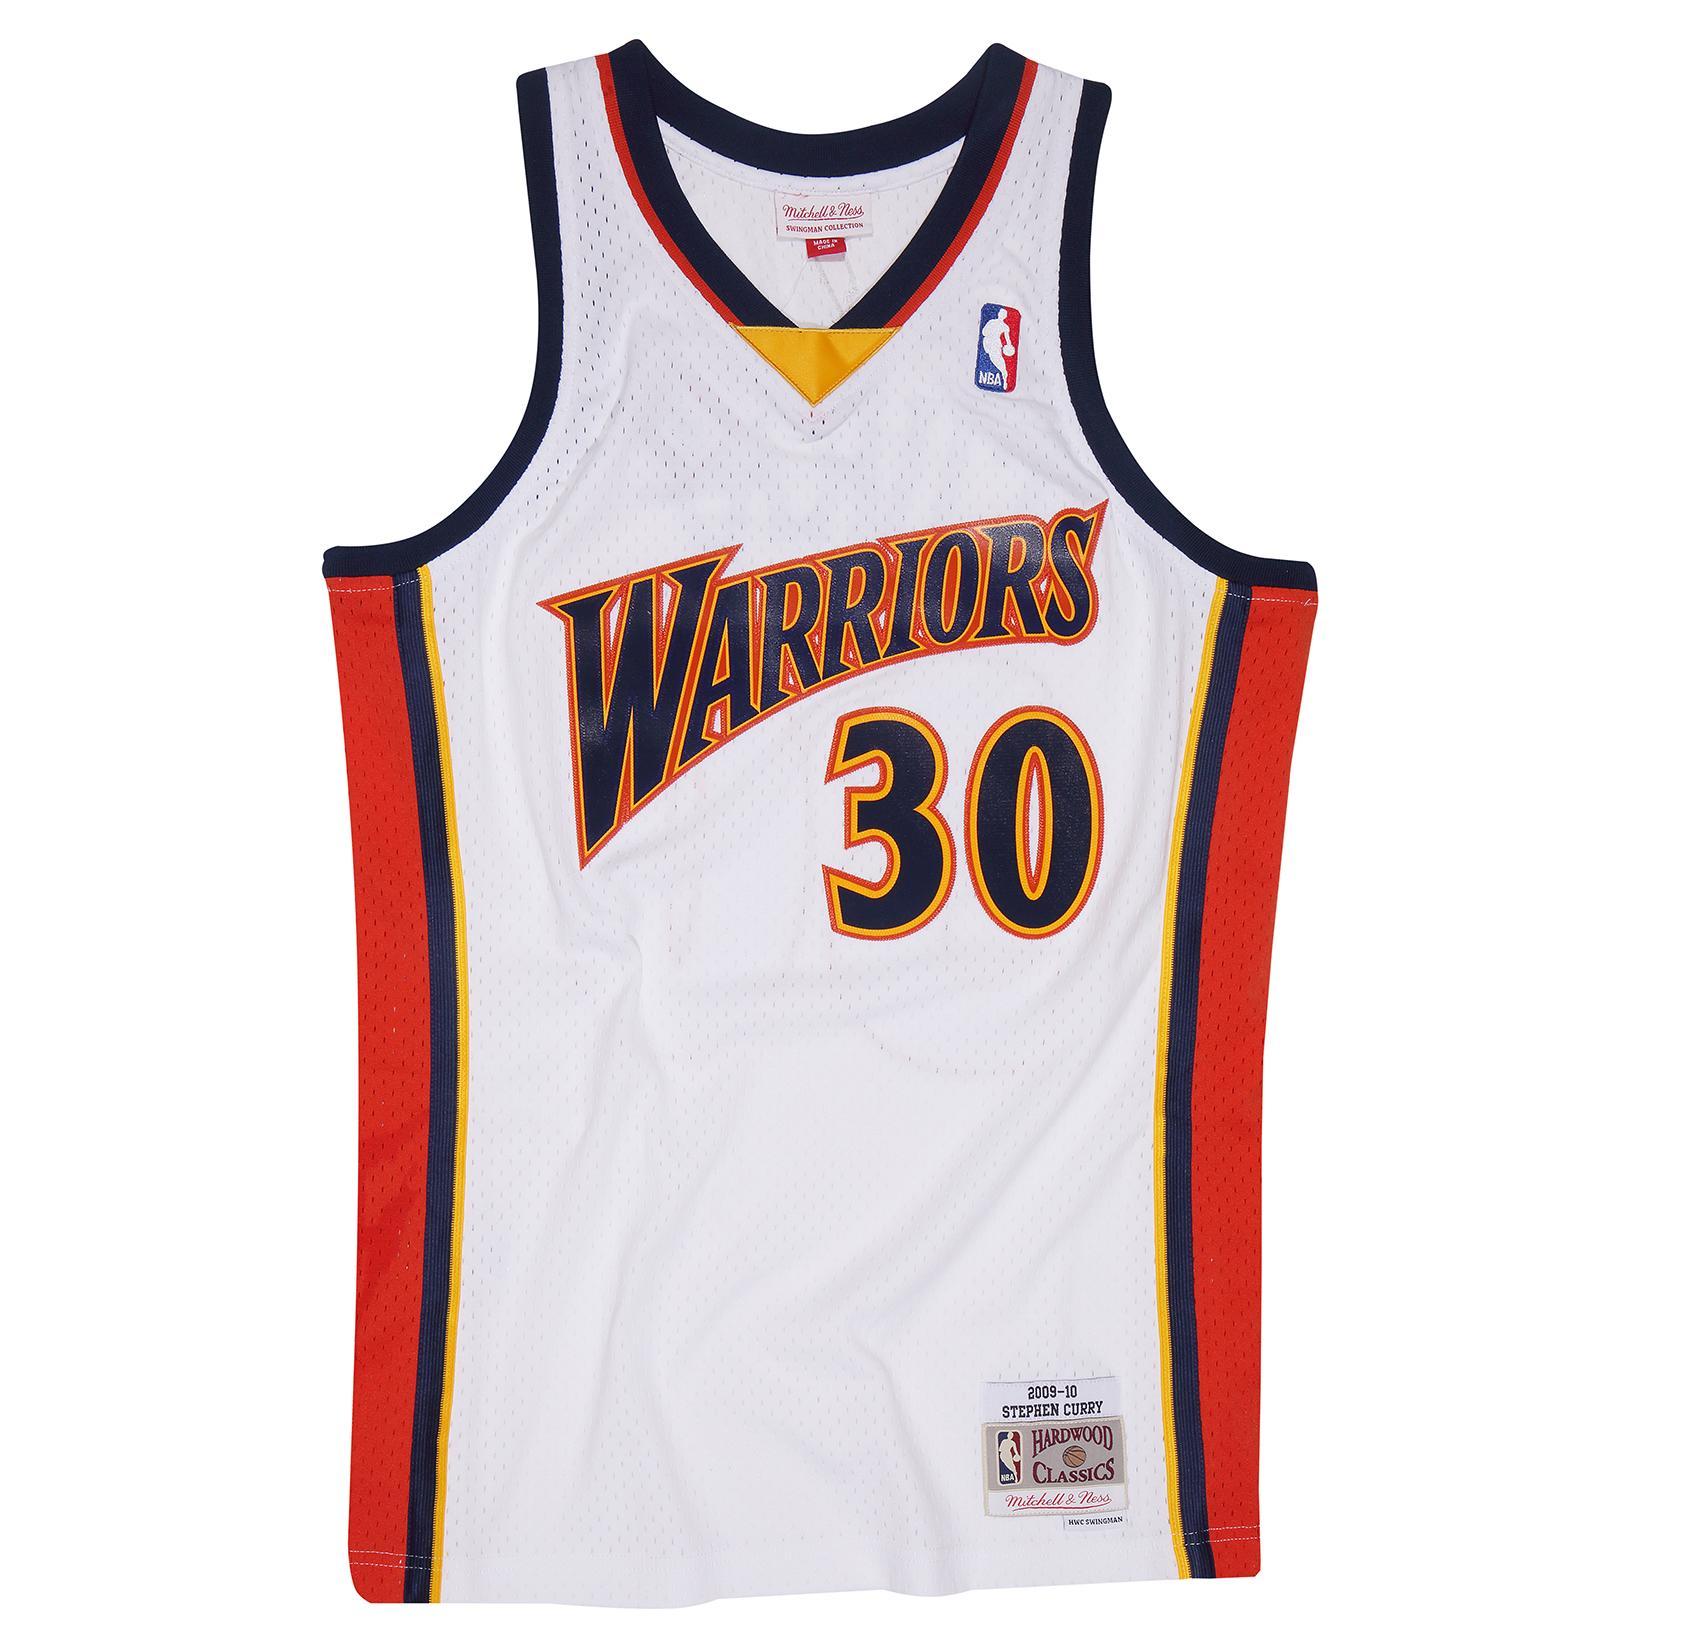 493e8fa49 Stephen Curry 2009-10 Home Swingman Jersey Golden State Warriors